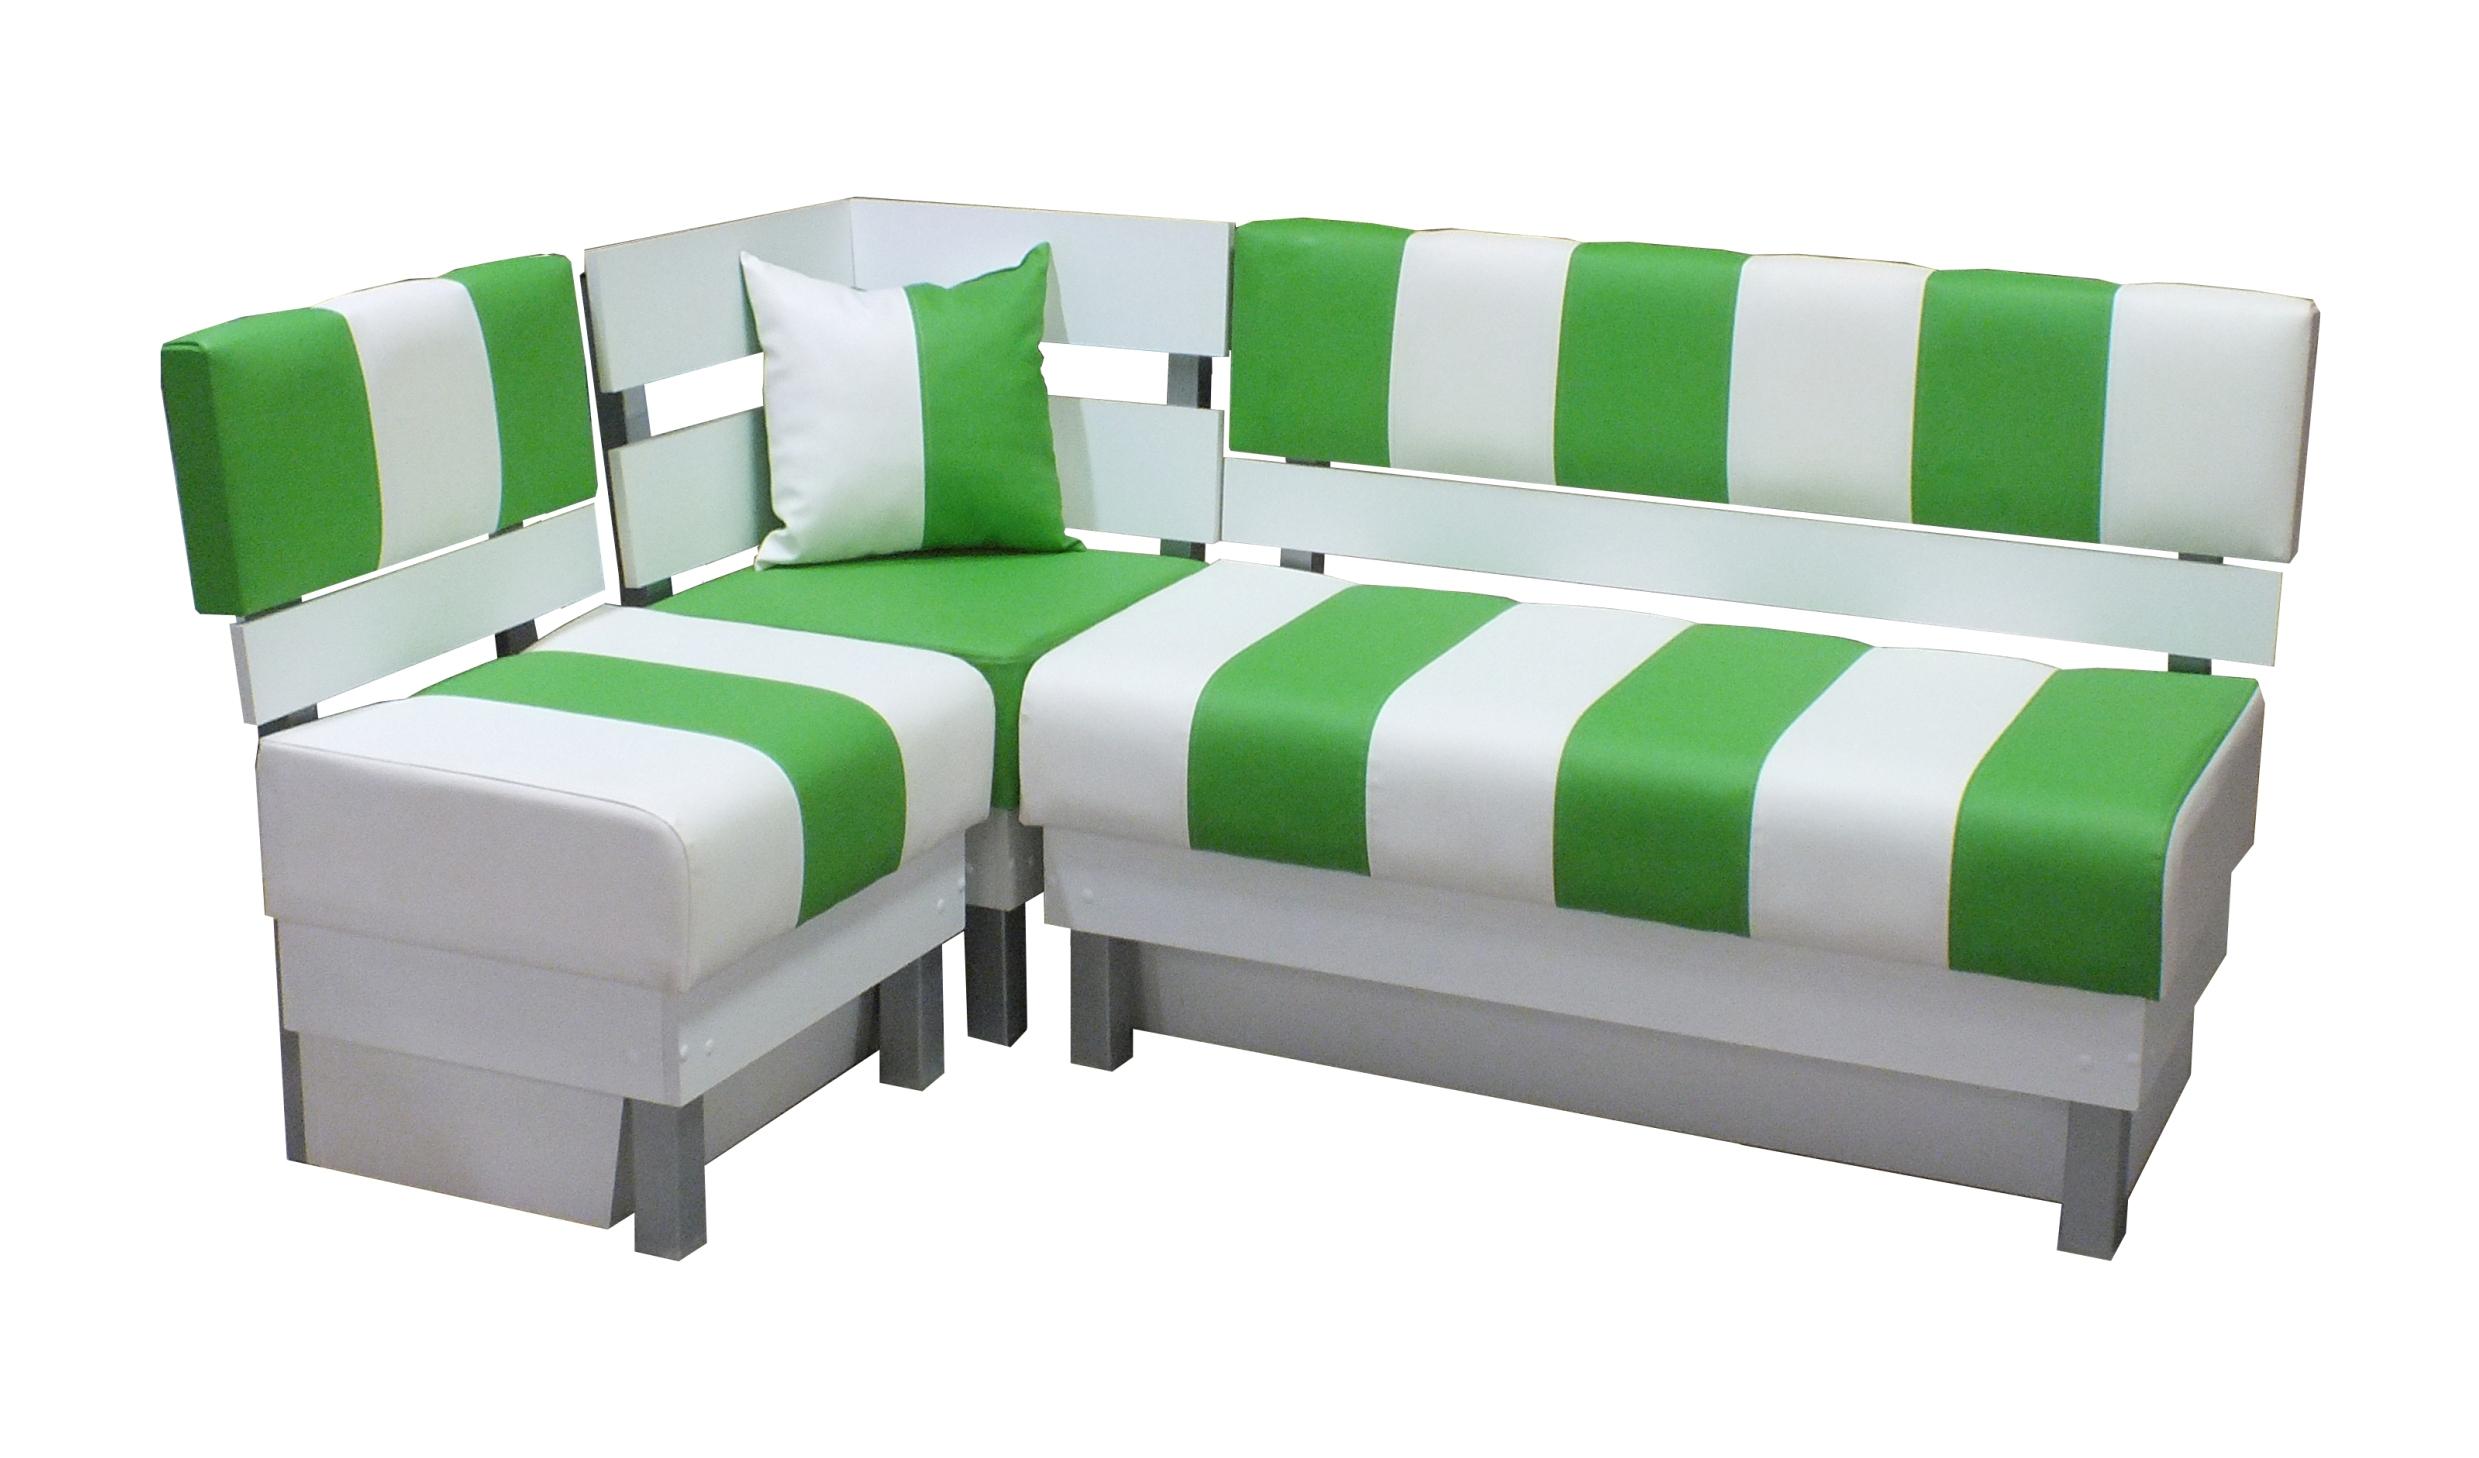 Кухонный угловой диван Домино фото